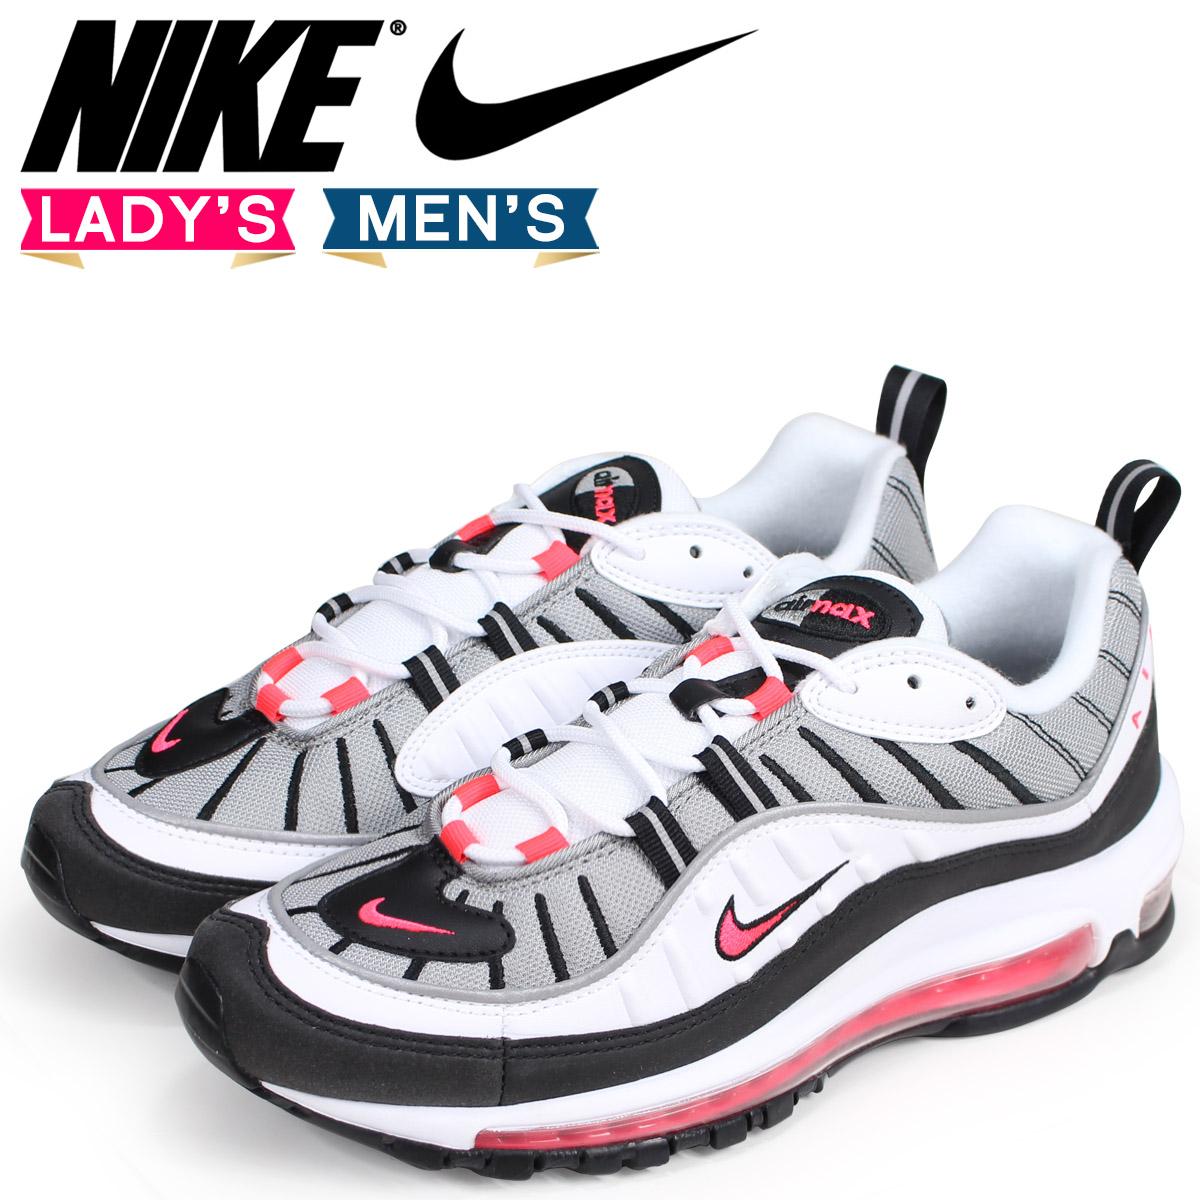 NIKE Kie Ney AMAX 98 lady's men's sneakers WMNS AIR MAX 98 AH6799 104 white white